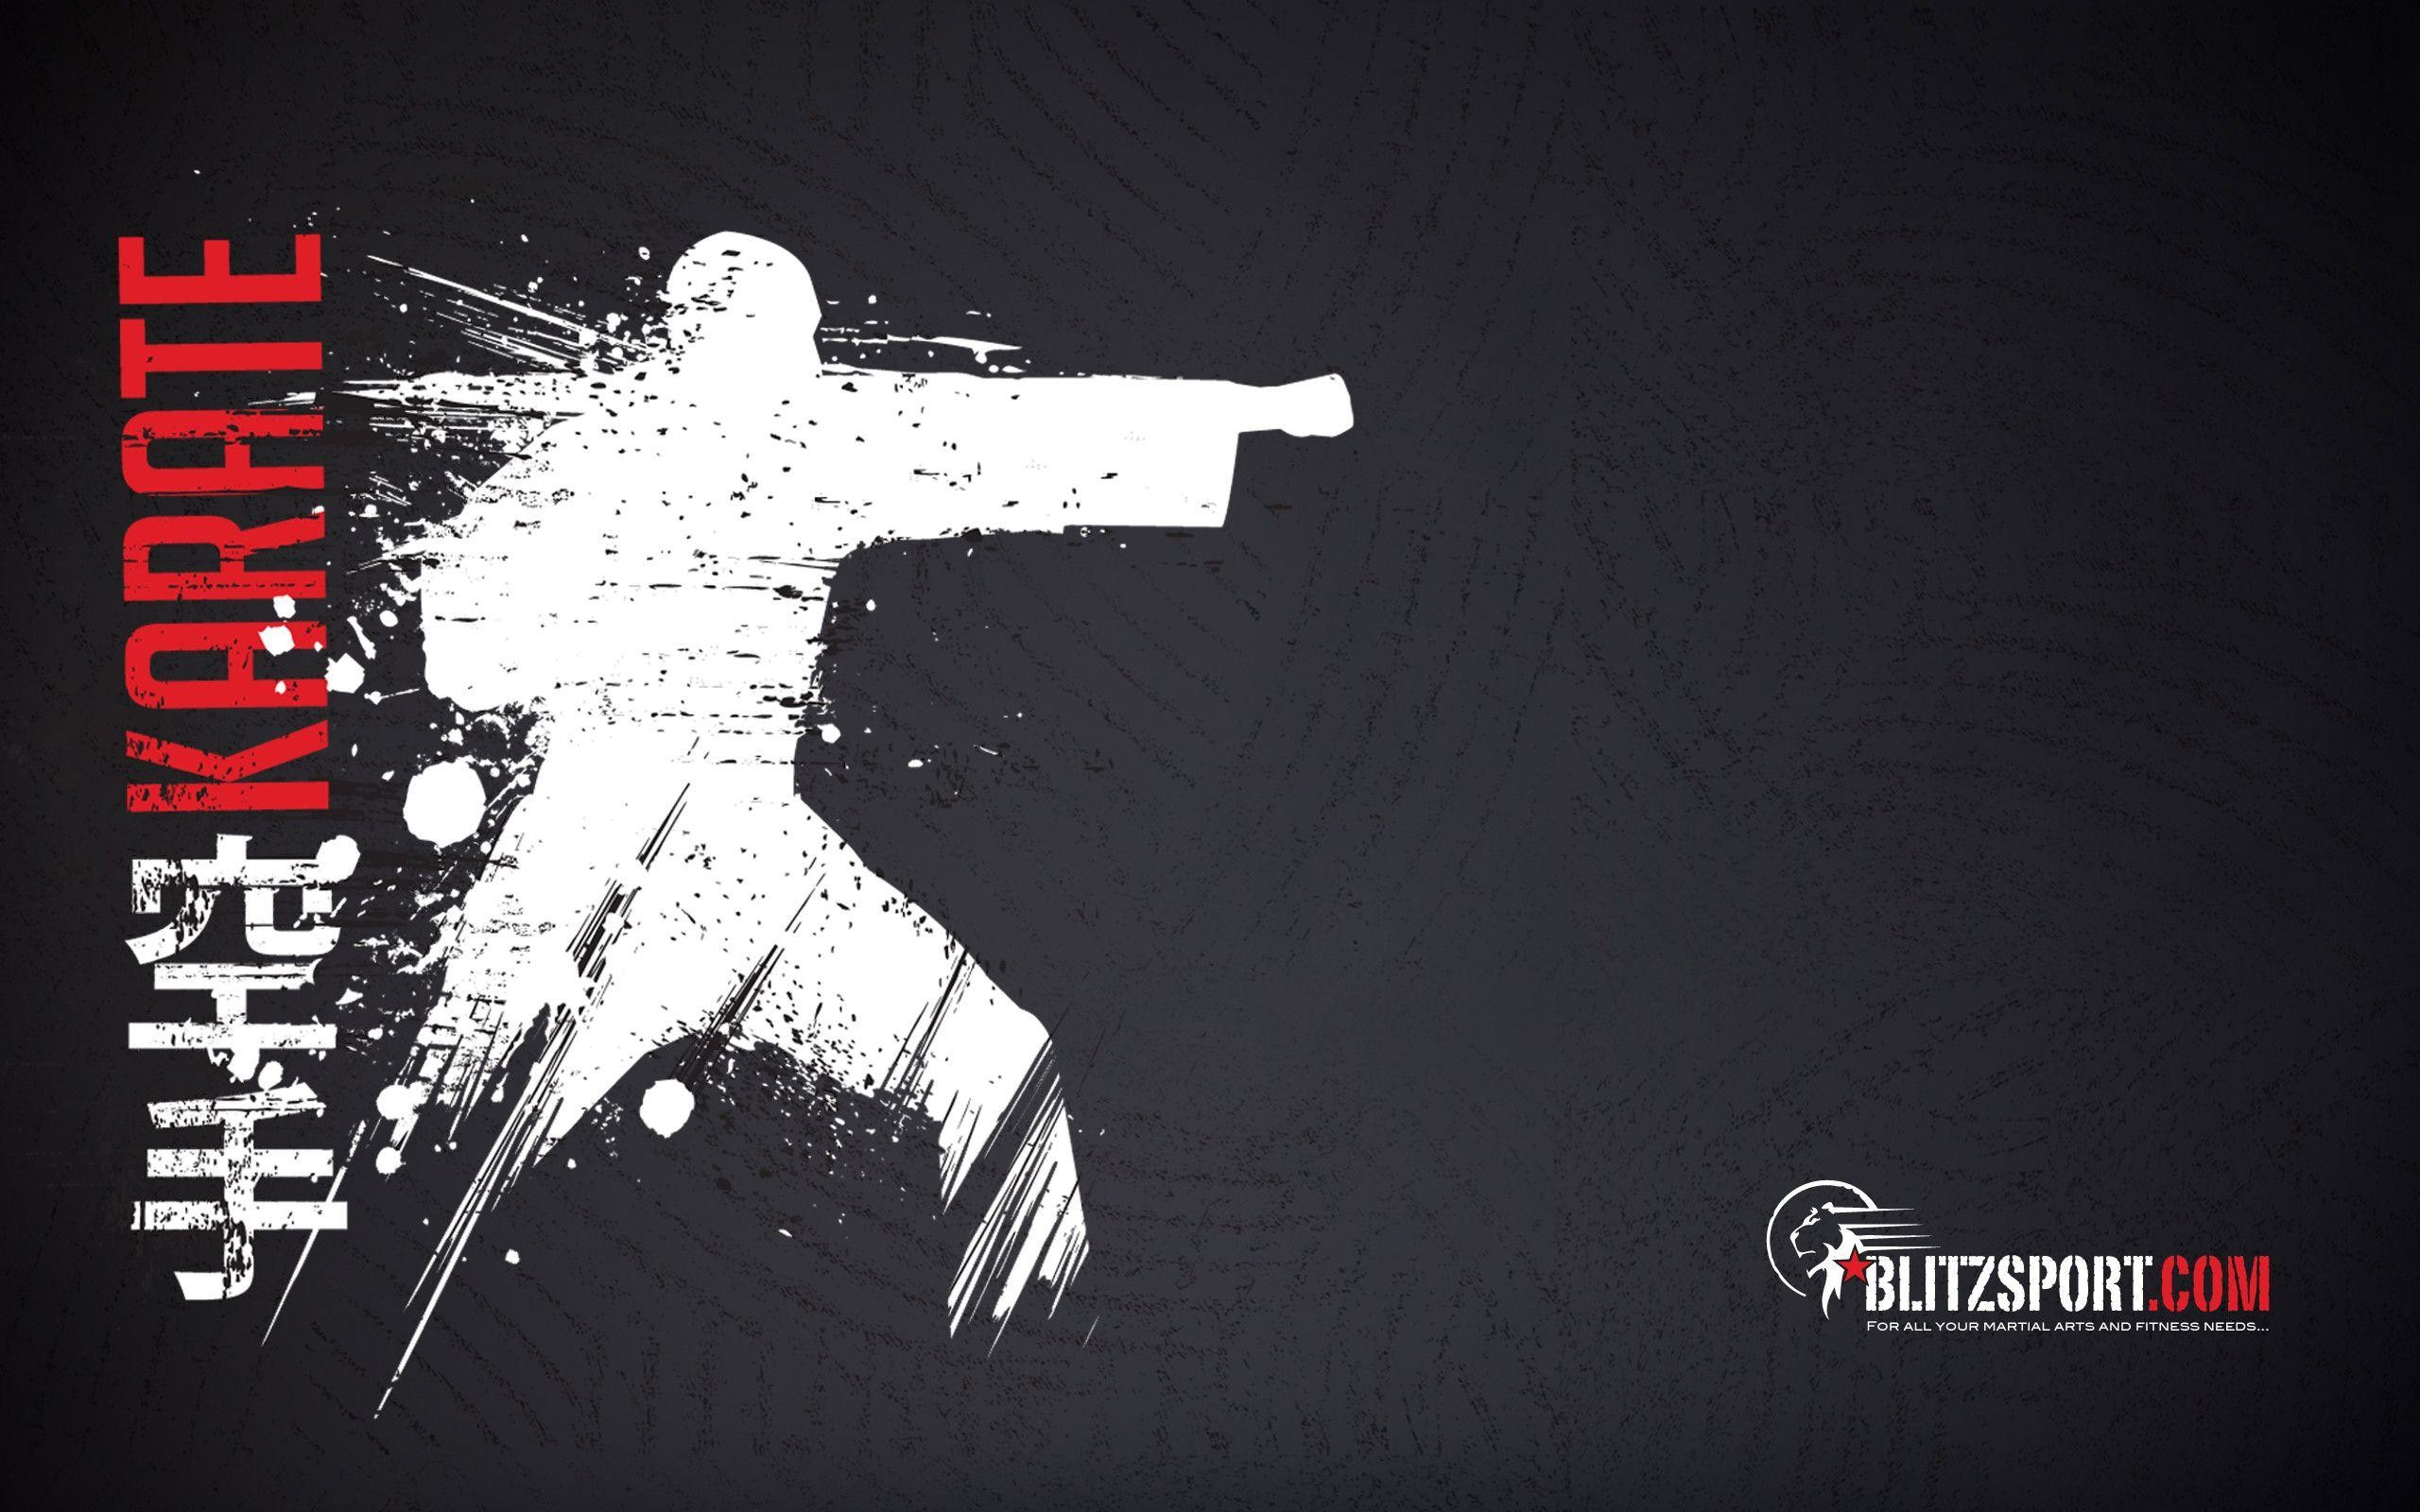 Taekwondo Itf Wallpaper 3d Karate Wallpaper 73 Images